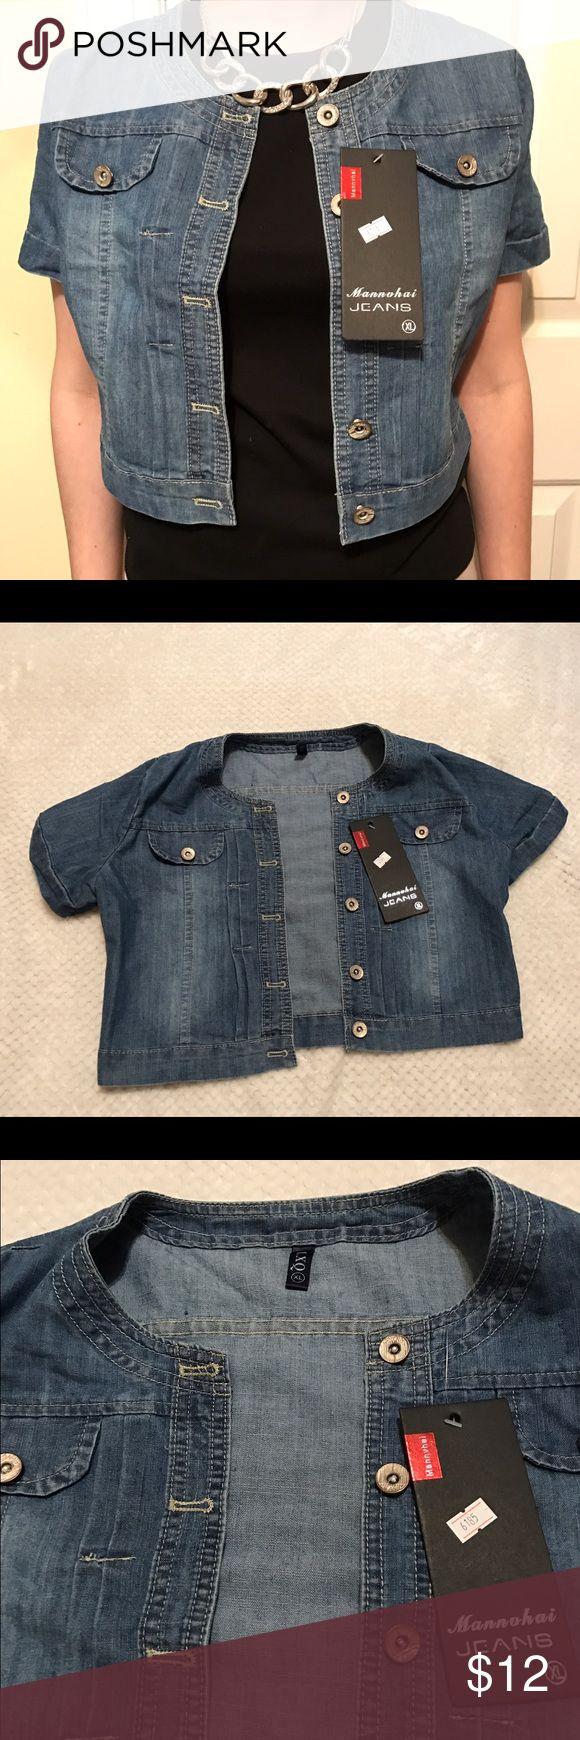 NWT Short sleeve jean jacket New with tags, short sleeve jean jacket, is an extra large but fits small. Mannuhai jeans Jackets & Coats Jean Jackets